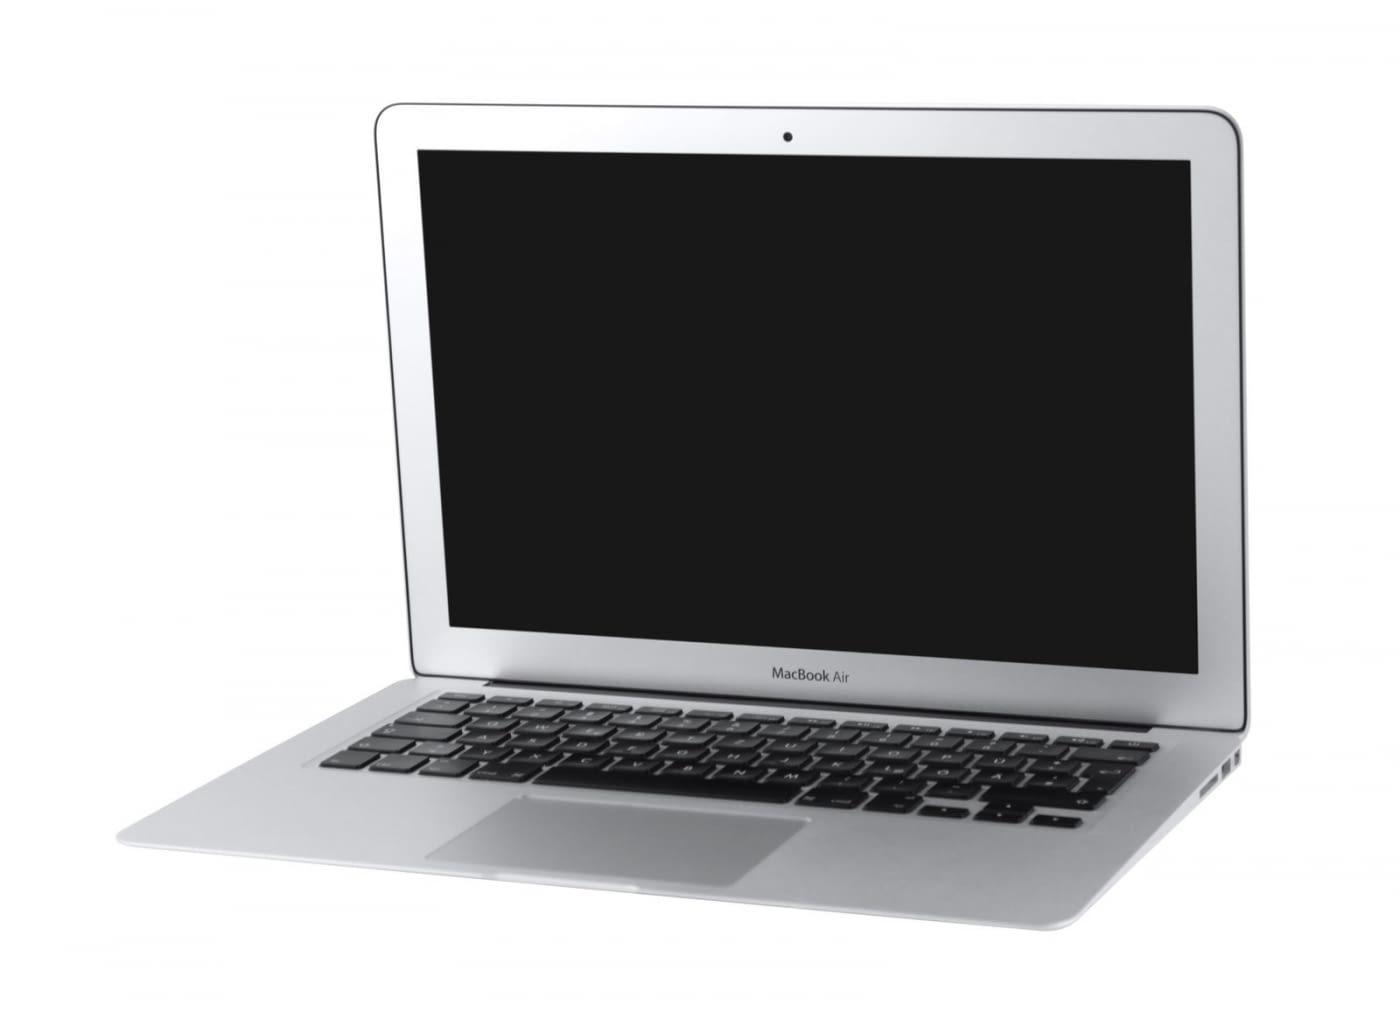 "Apple MacBook Air 13,3"" 2,13Ghz, 4GB Ram, 256GB SSD -"